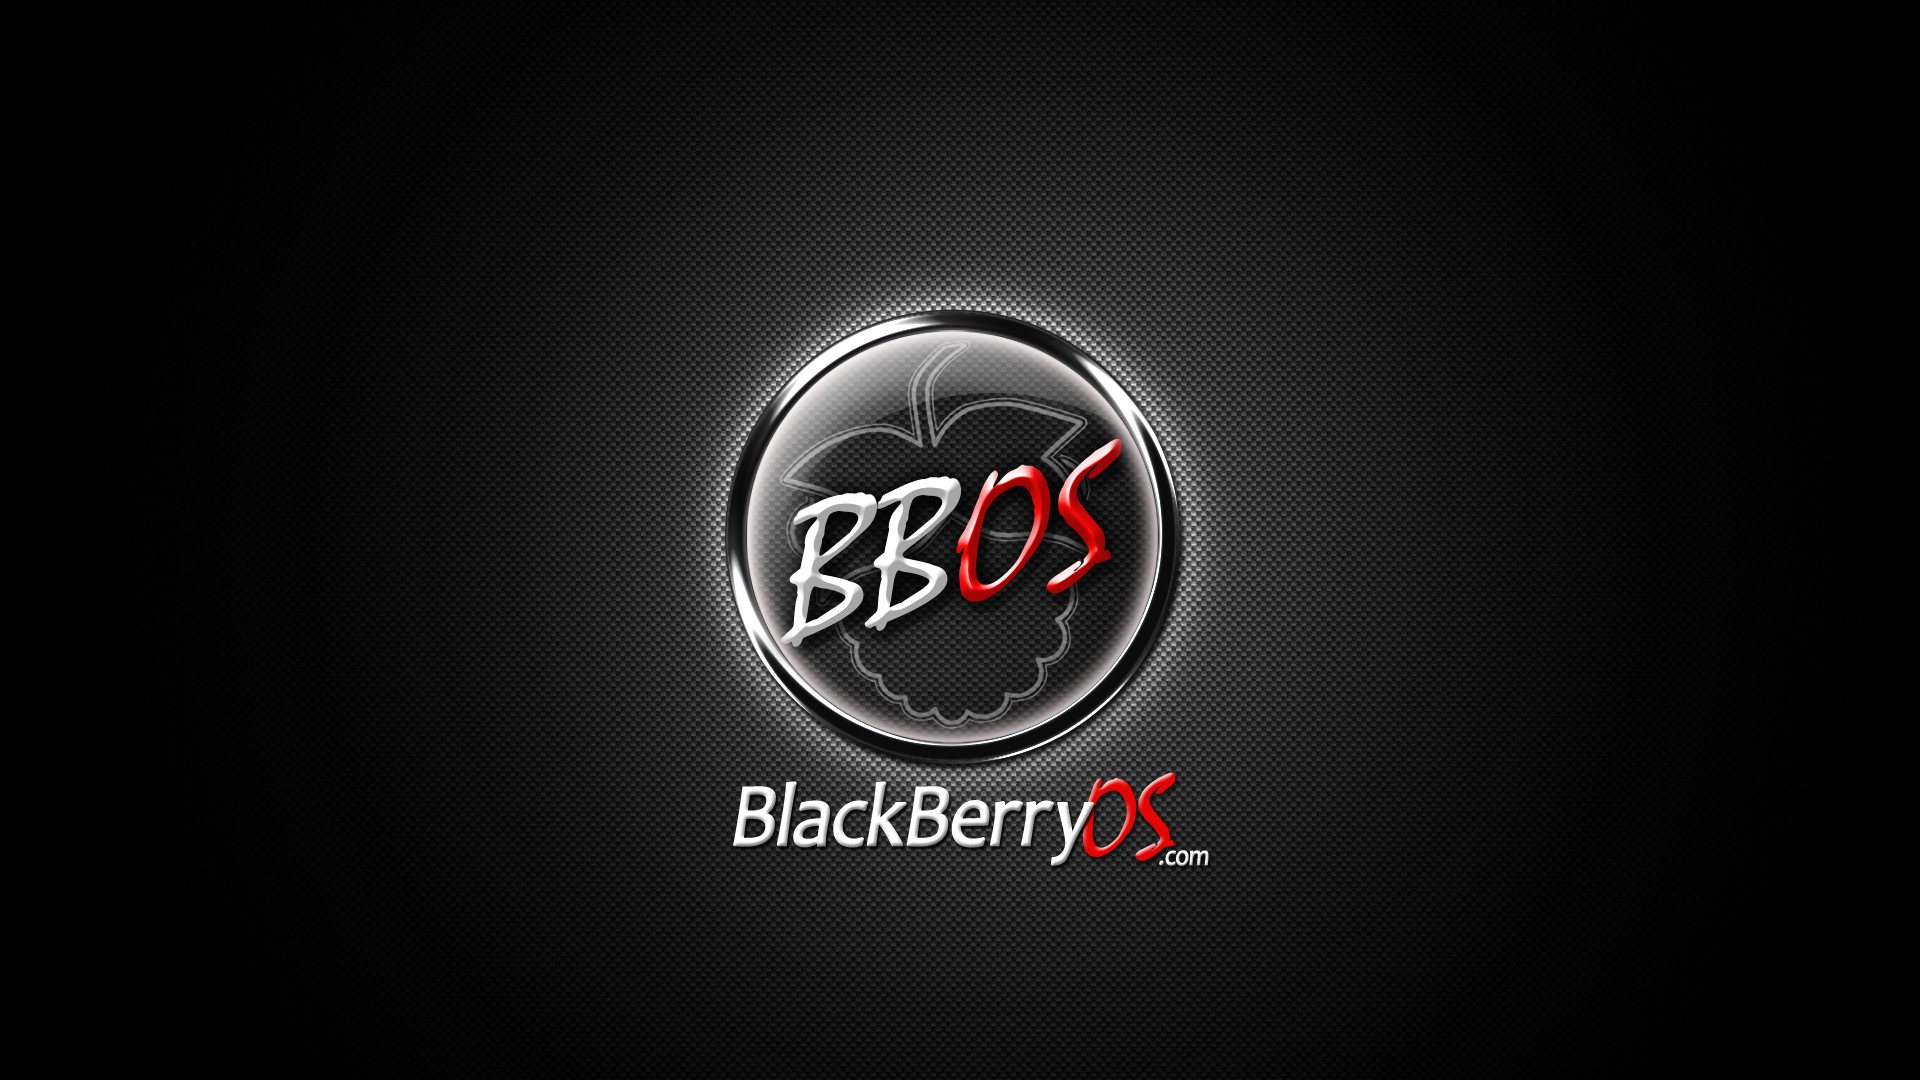 Black berry wallpapers impremedia wallpaper desktop desktop wallpapers blackberry image 1920x1080 voltagebd Gallery